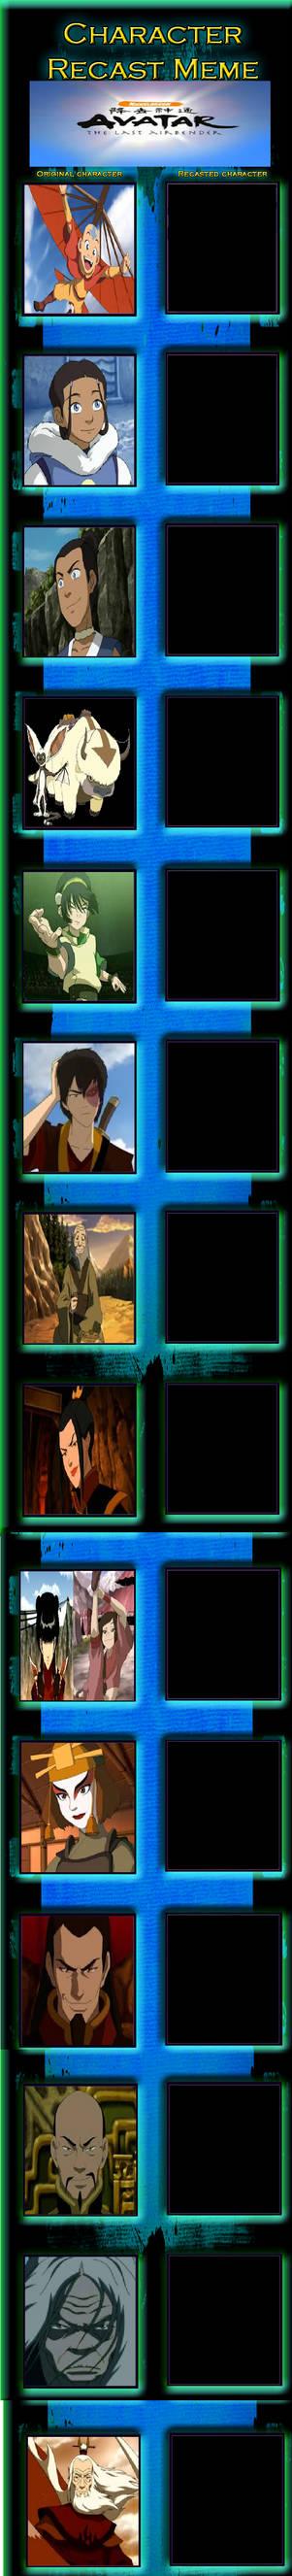 Avatar the last Airbender Recast Meme